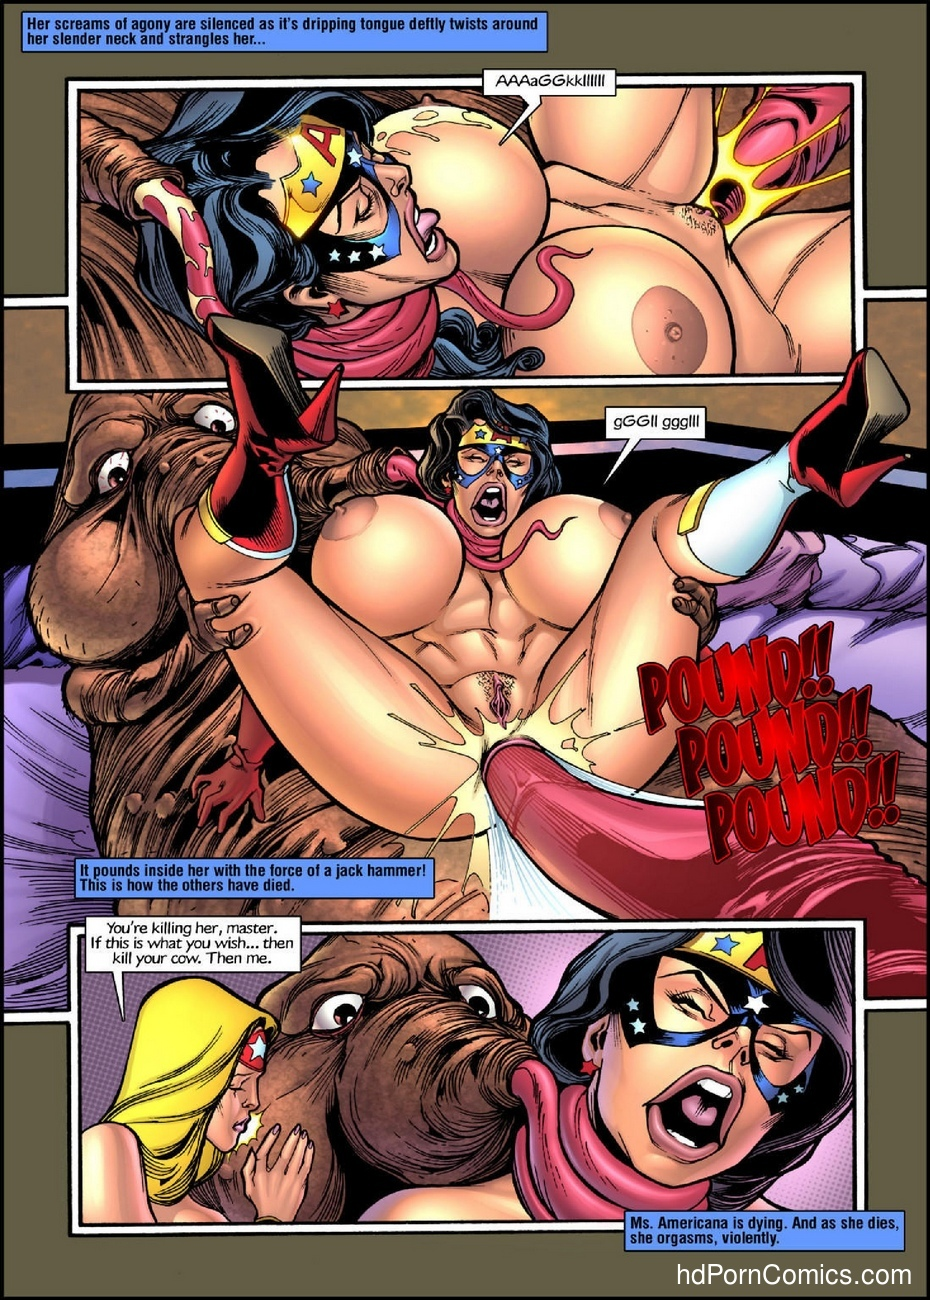 Freedom Stars - Cattle Call 1 58 free sex comic